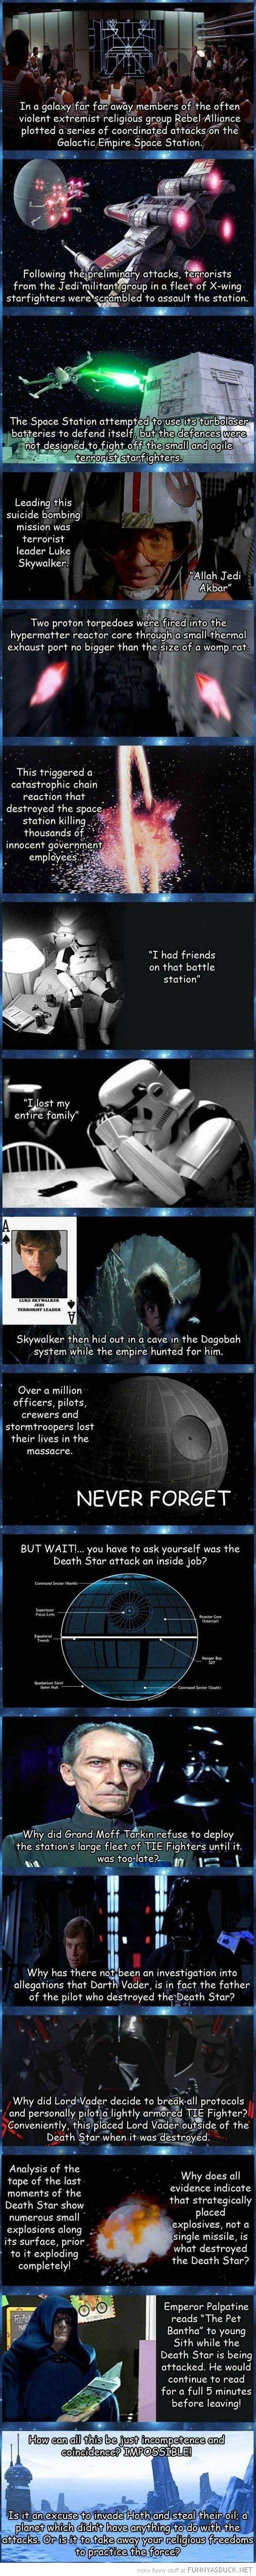 The Death Star Was An Inside Job